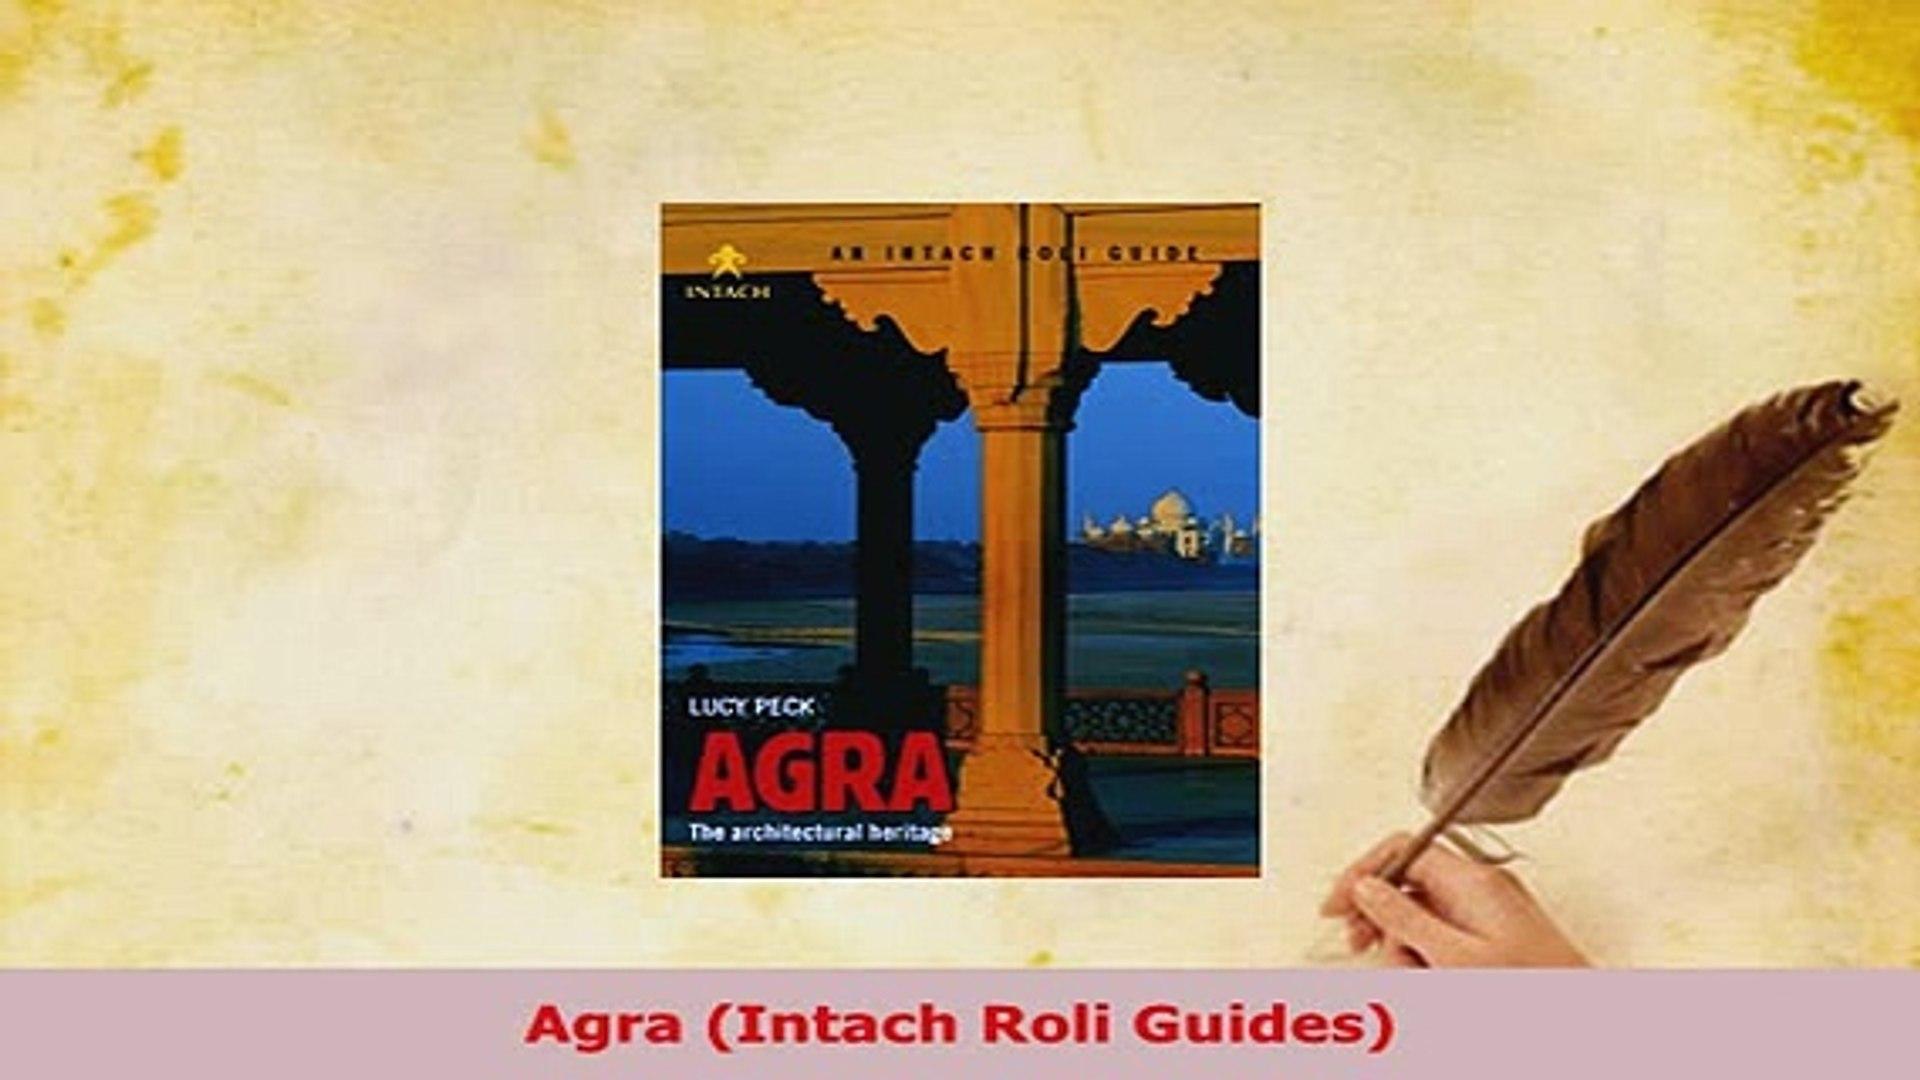 Agra (Intach Roli Guides)